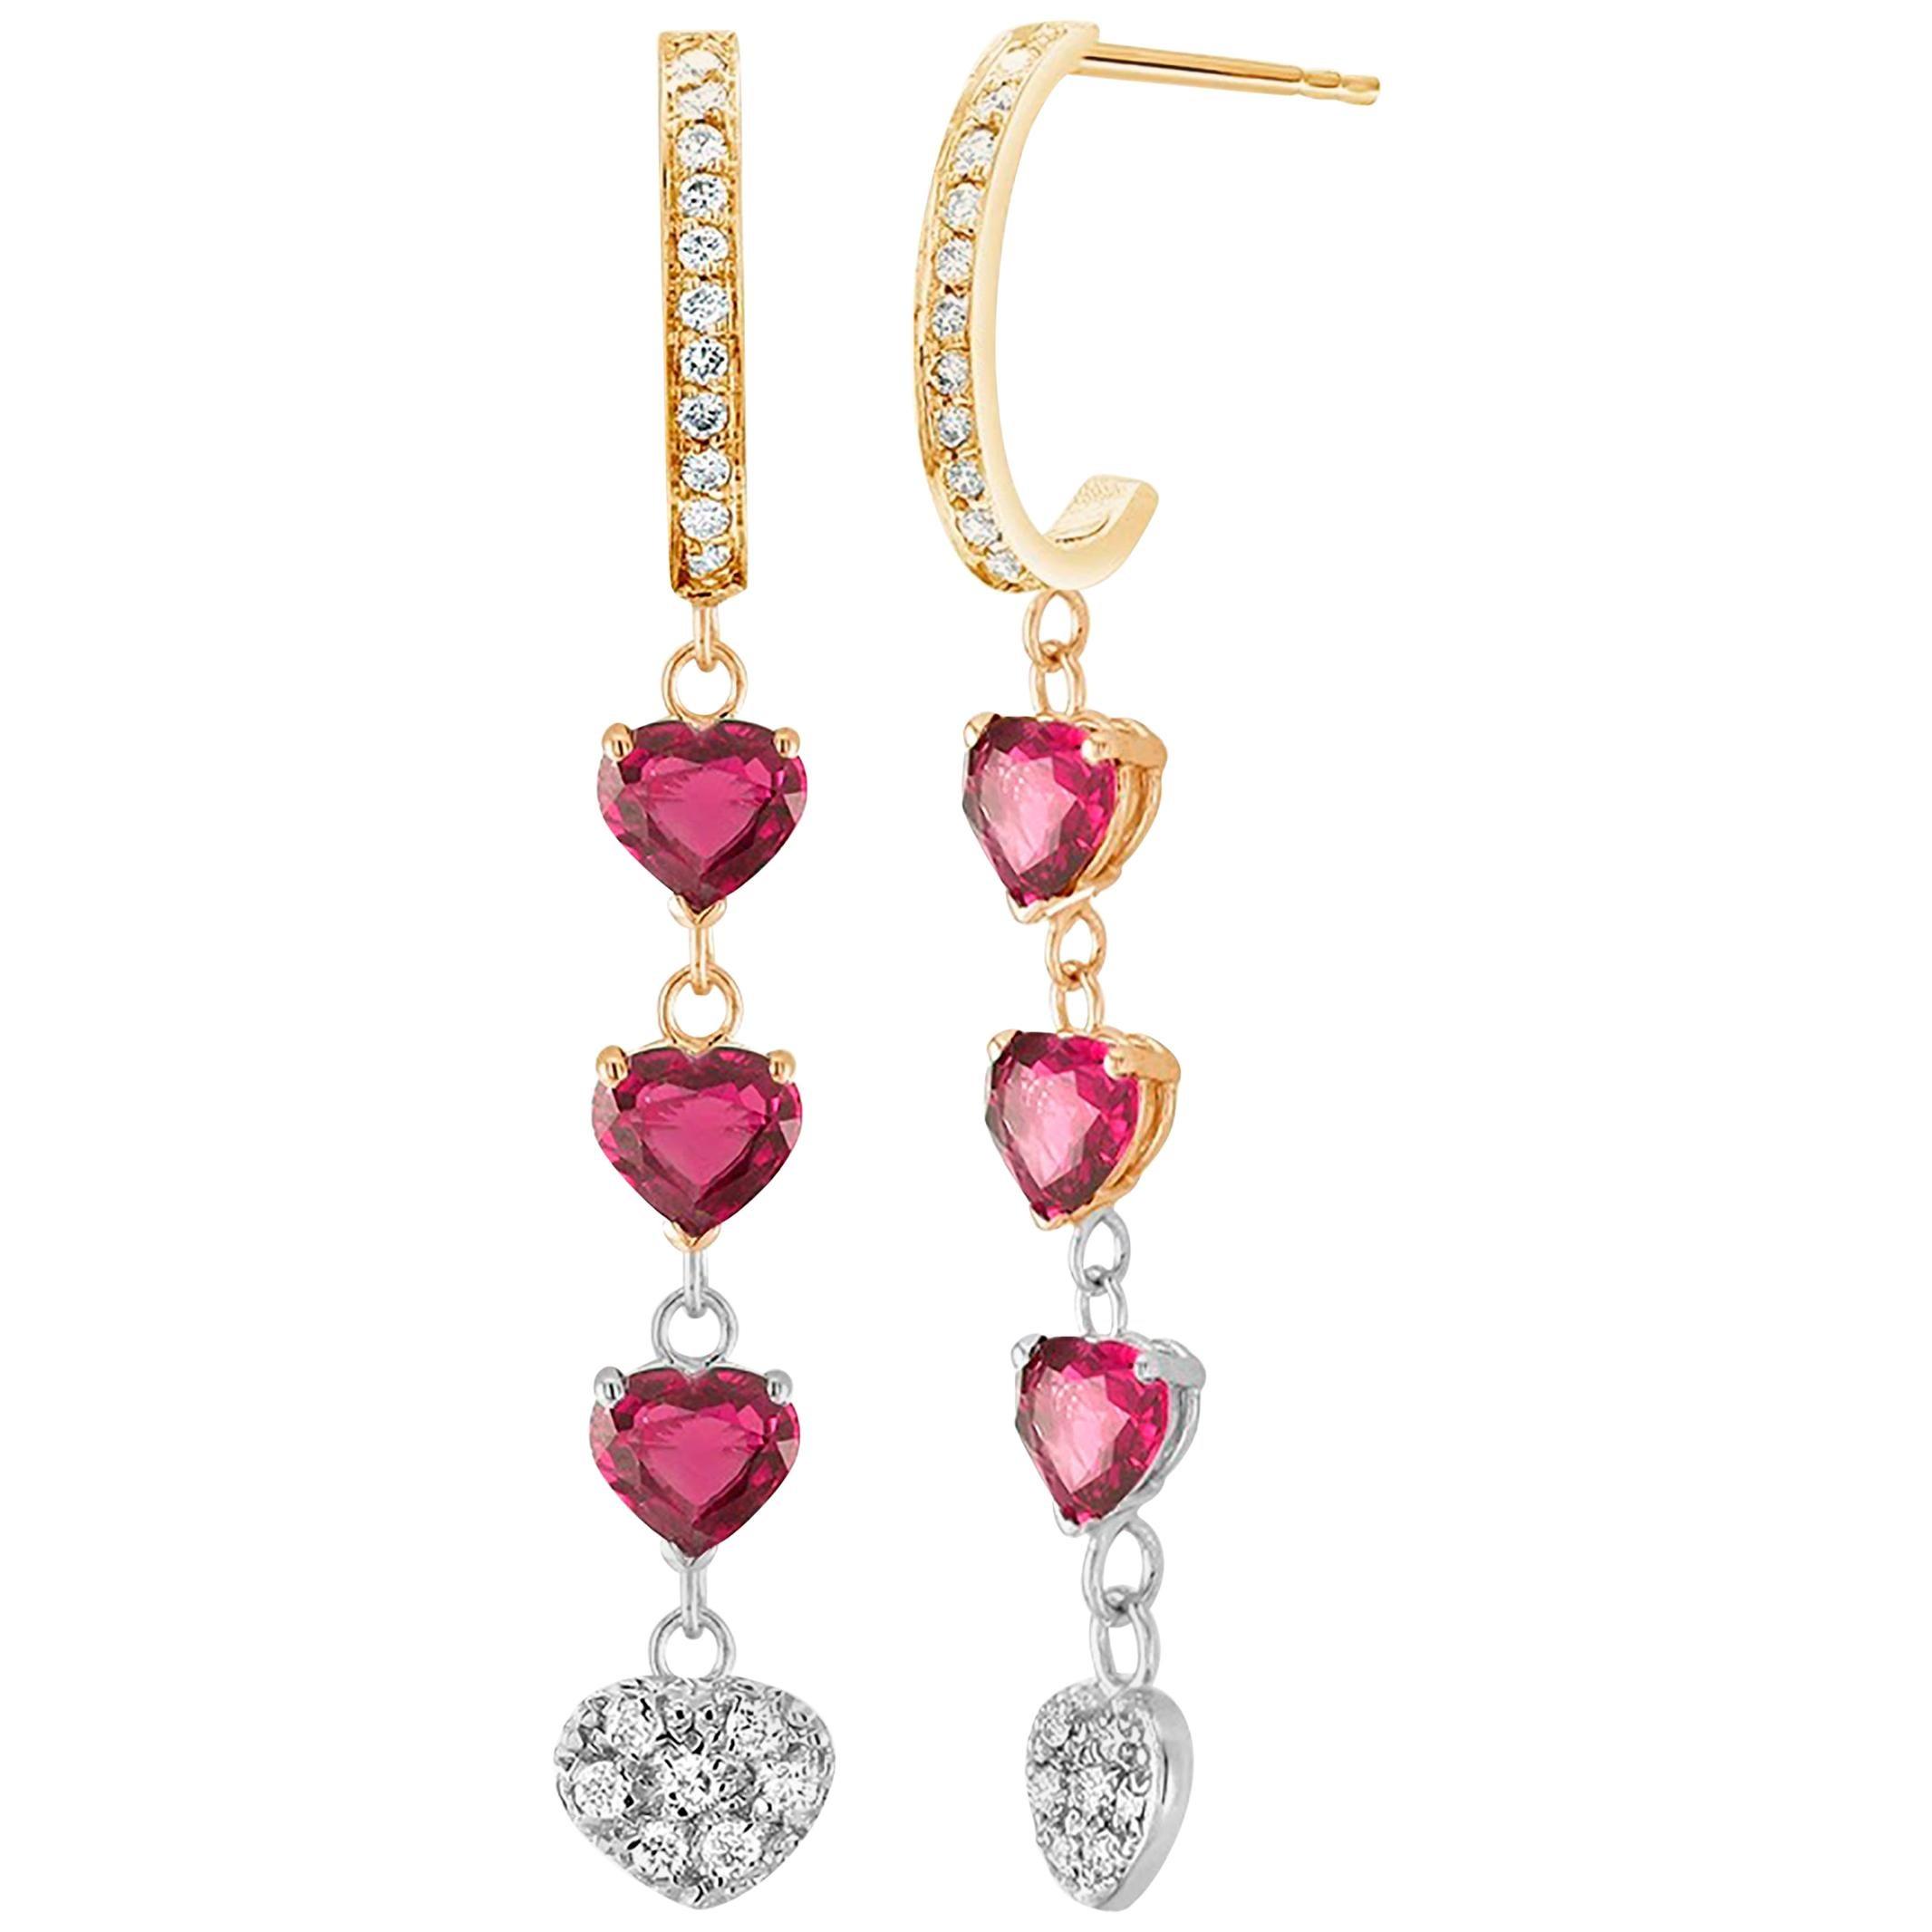 Six Heart Shape Burma Ruby and Diamond Yellow and White Gold Hoop Drop Earrings